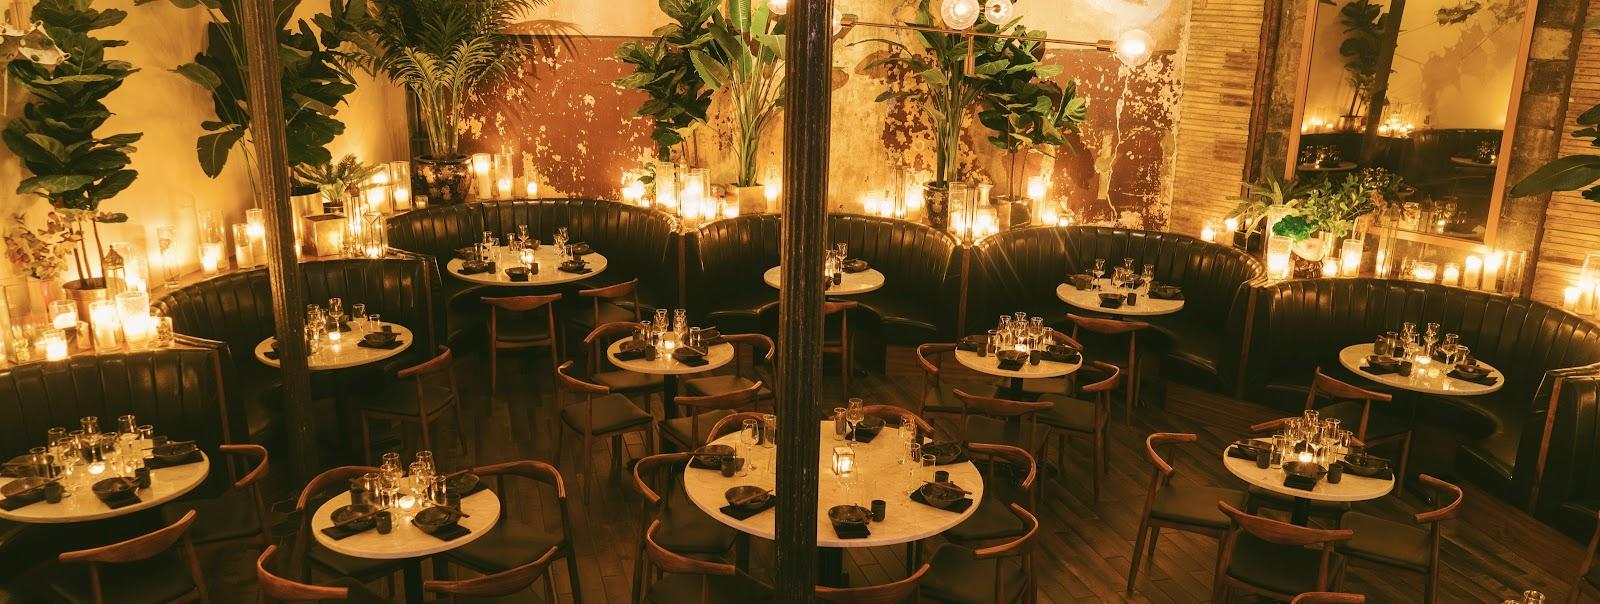 valentines day  restaurants in nyc